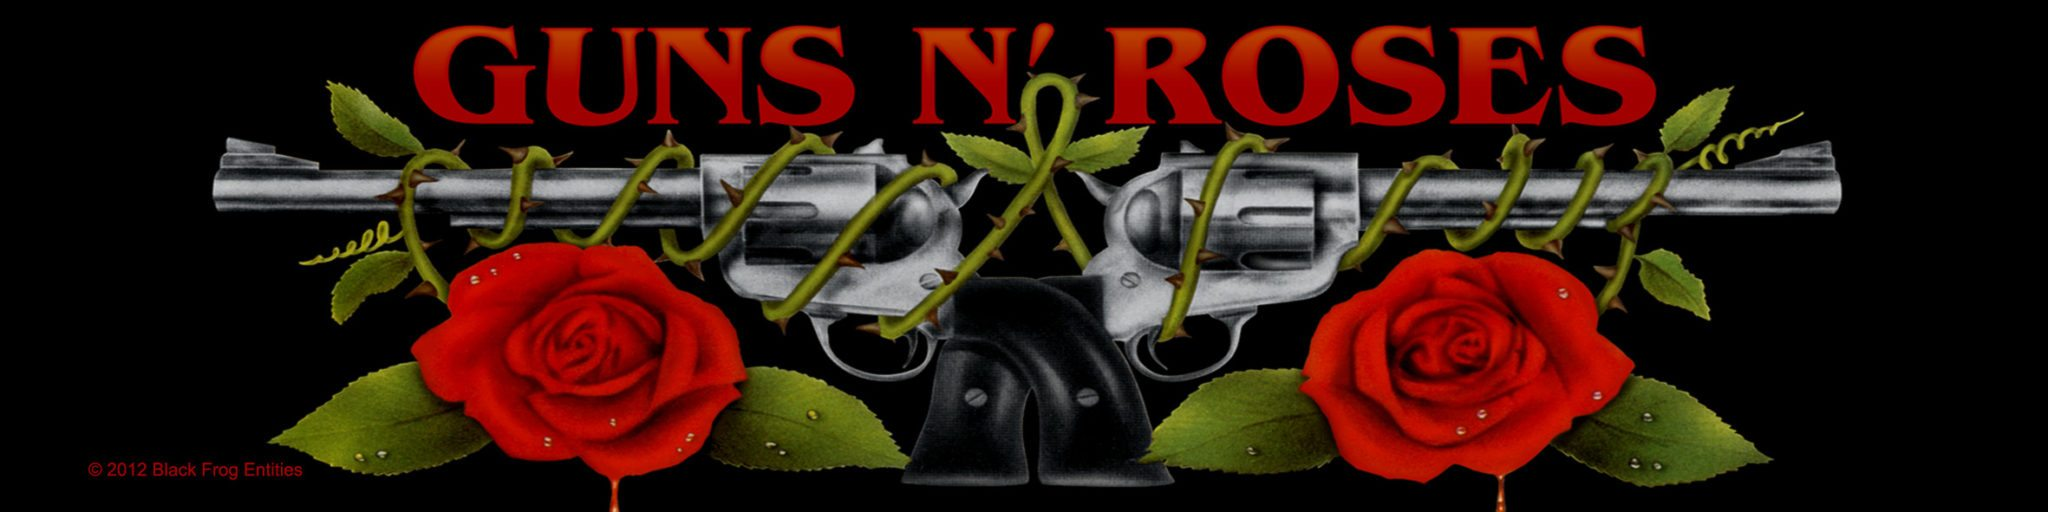 Guns N Roses Woven Superstrip Logo/Roses